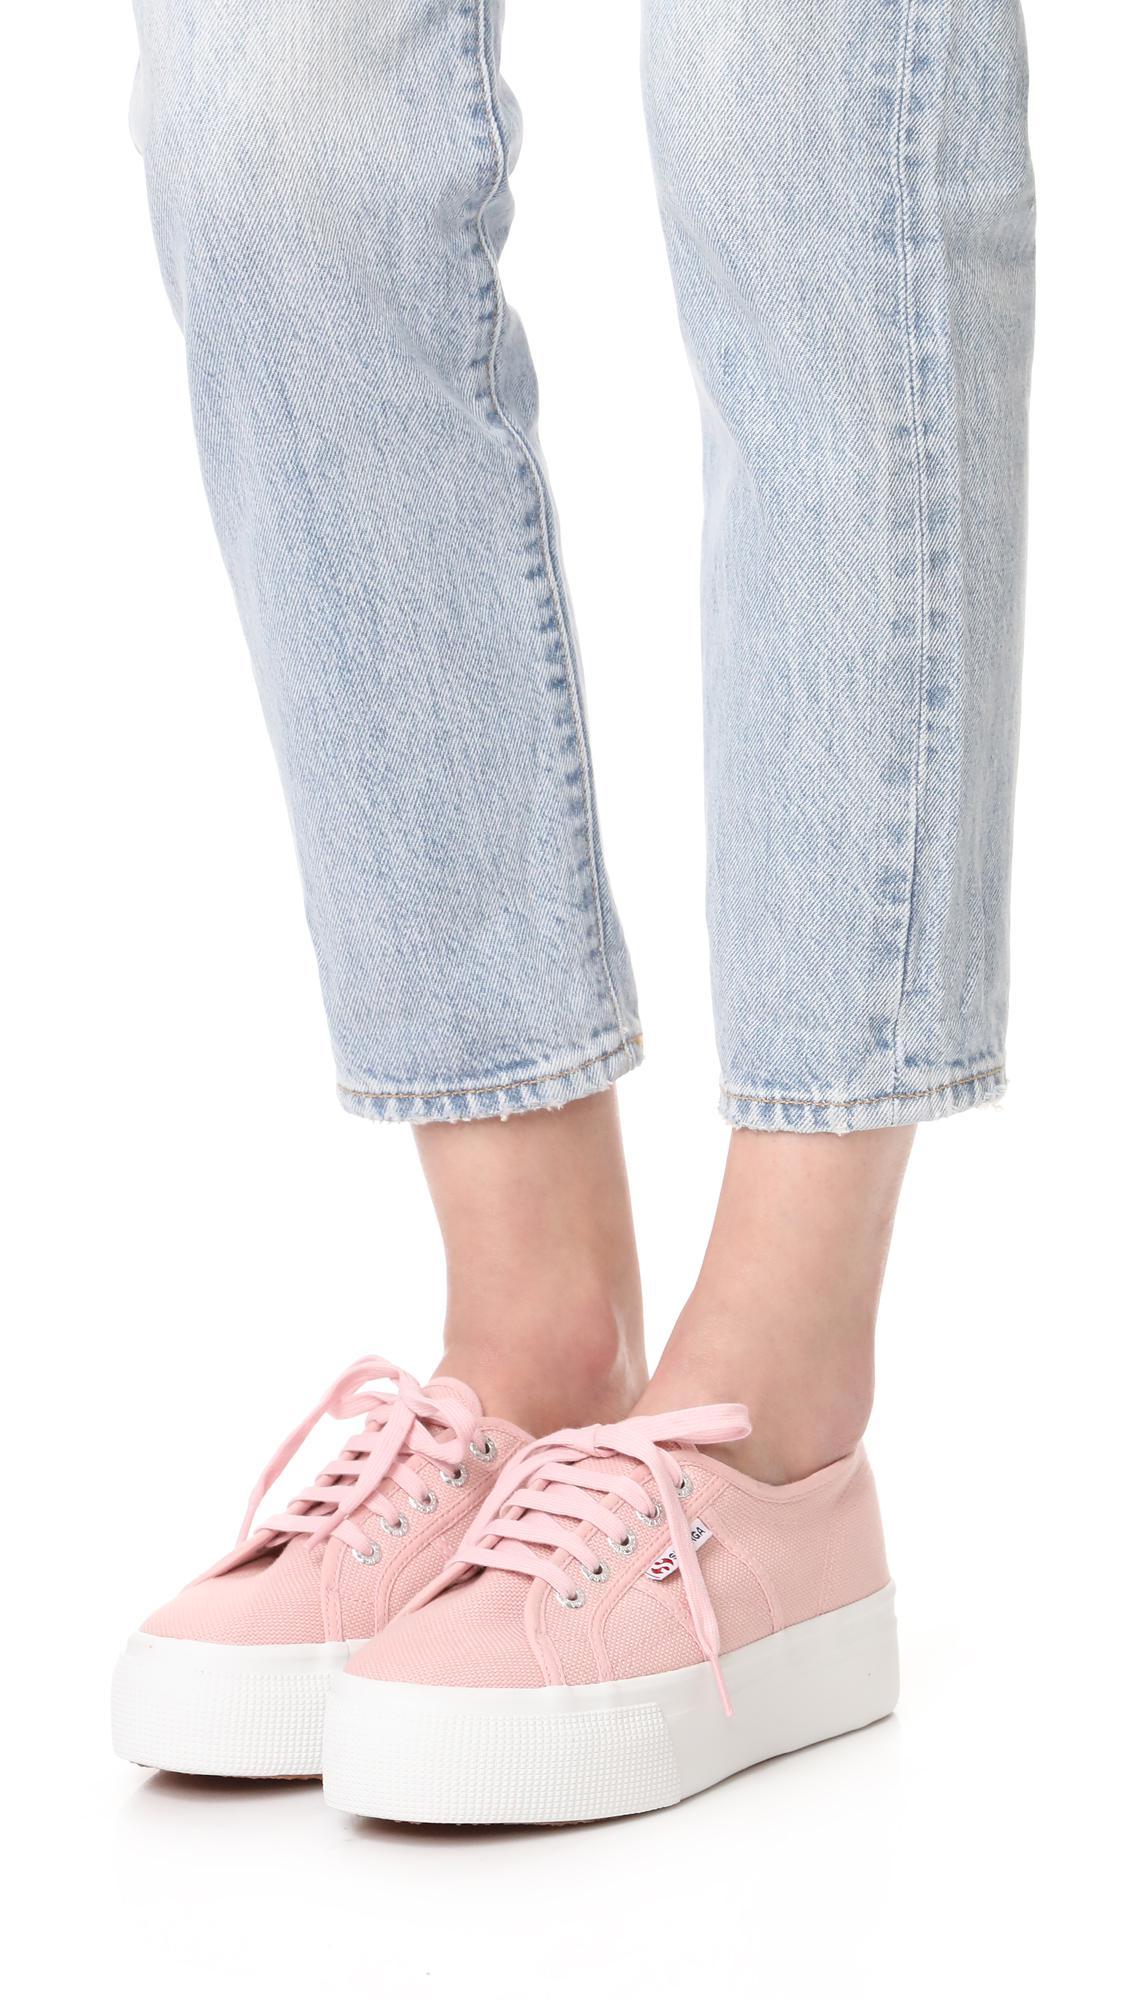 b2e0097270e Superga - Pink 2790 Platform Sneakers - Lyst. View fullscreen